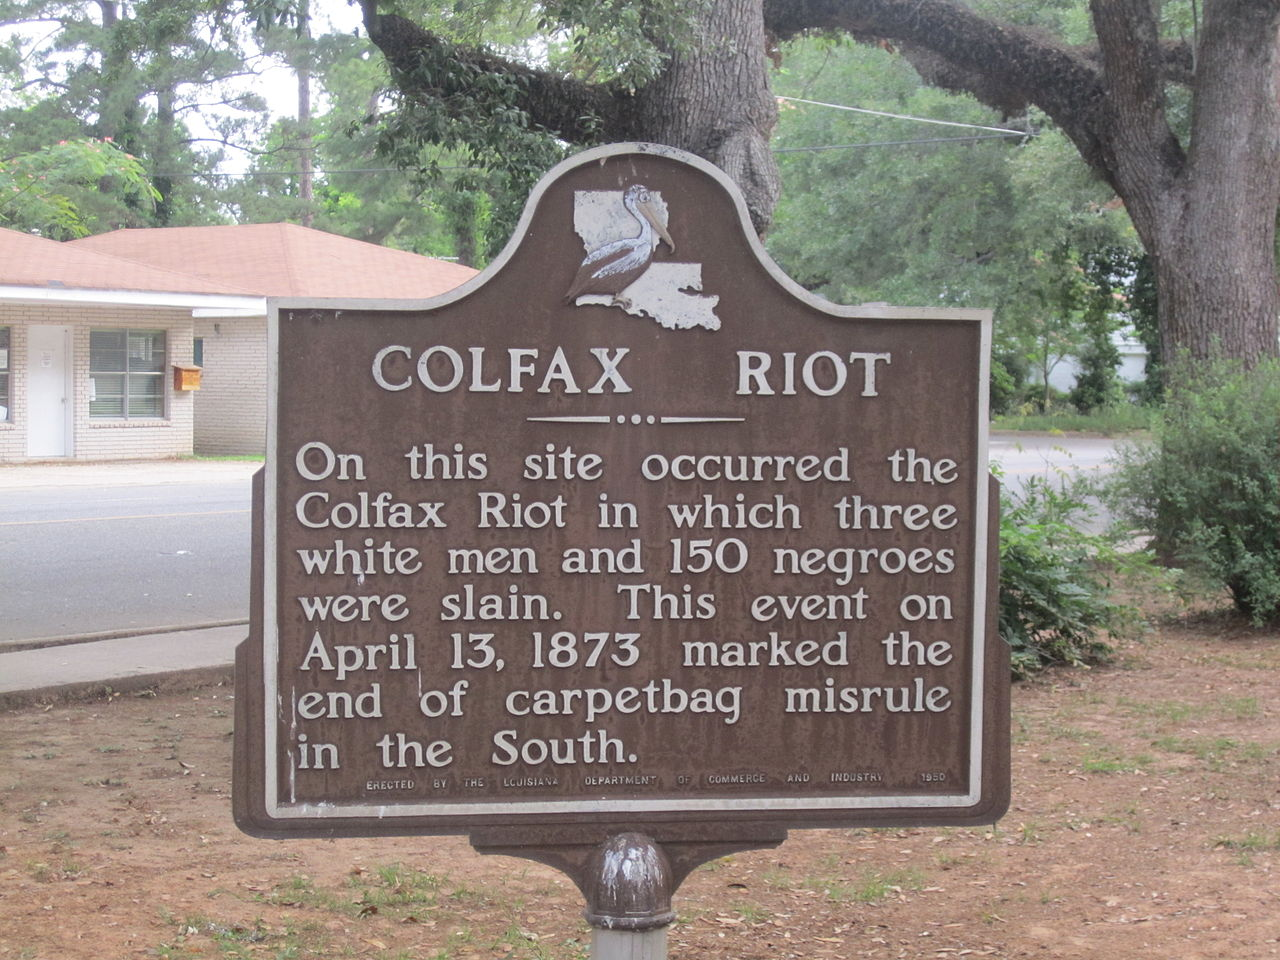 A Louisiana state wayside marker blames